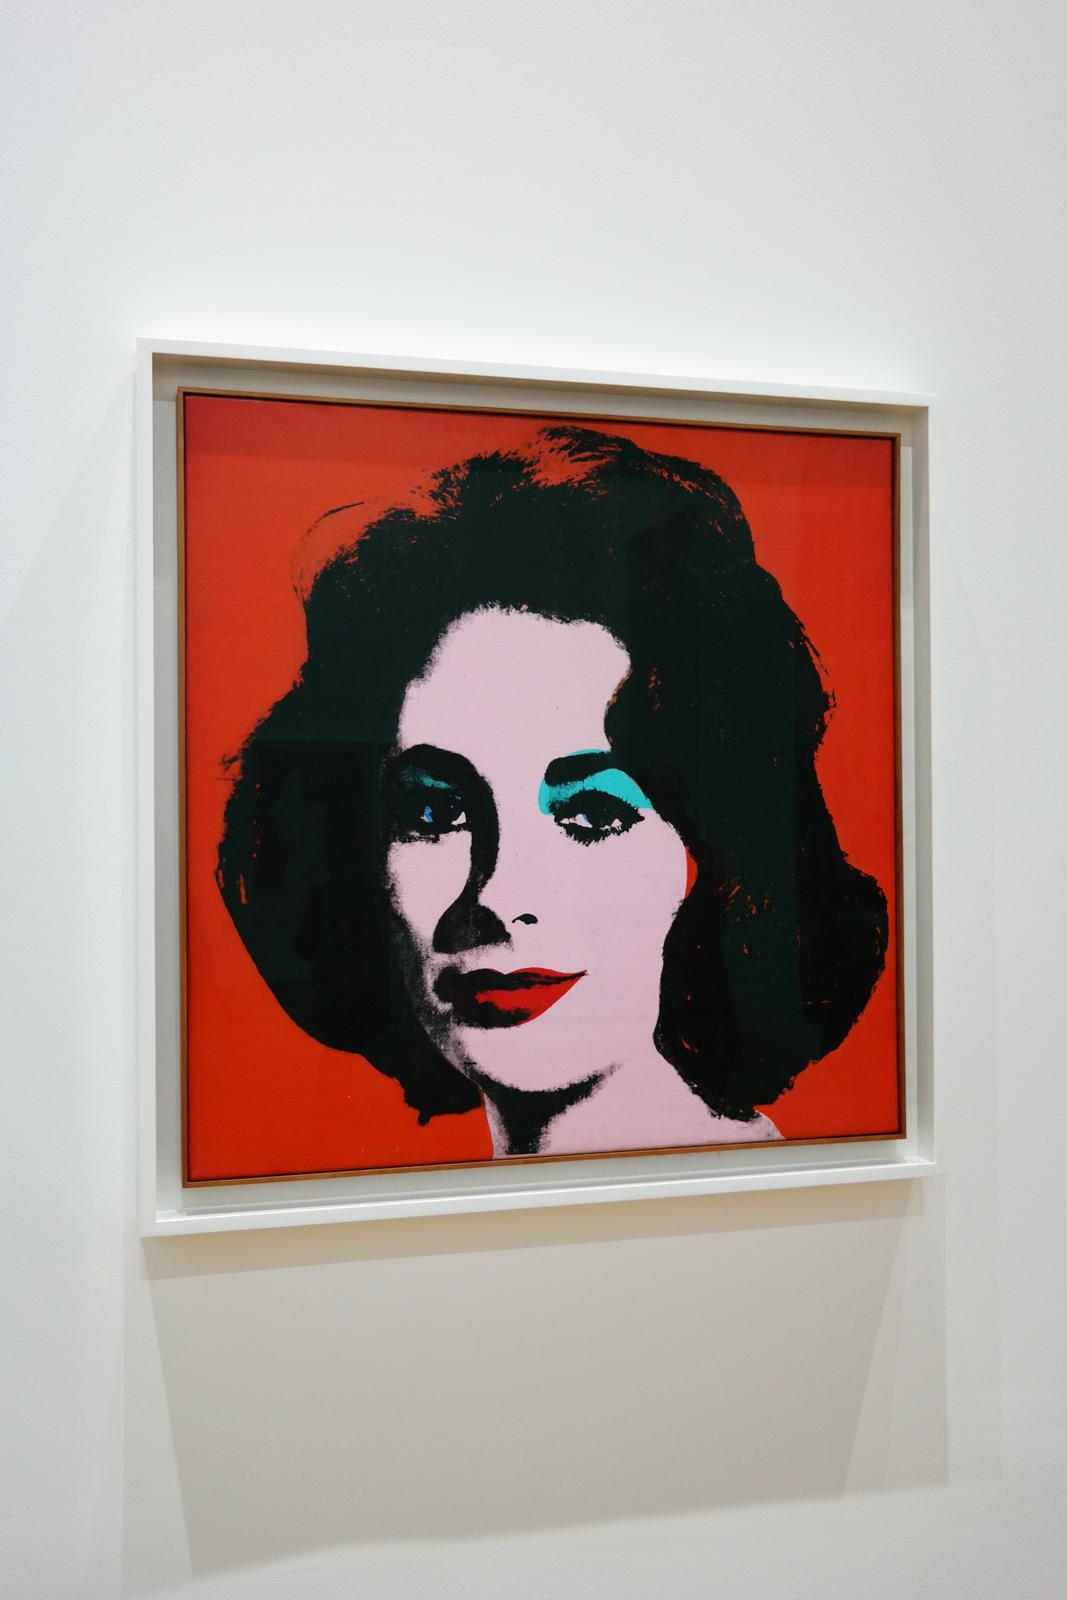 Liz #6 (Early Colored Liz), 1963, Andy Warhol